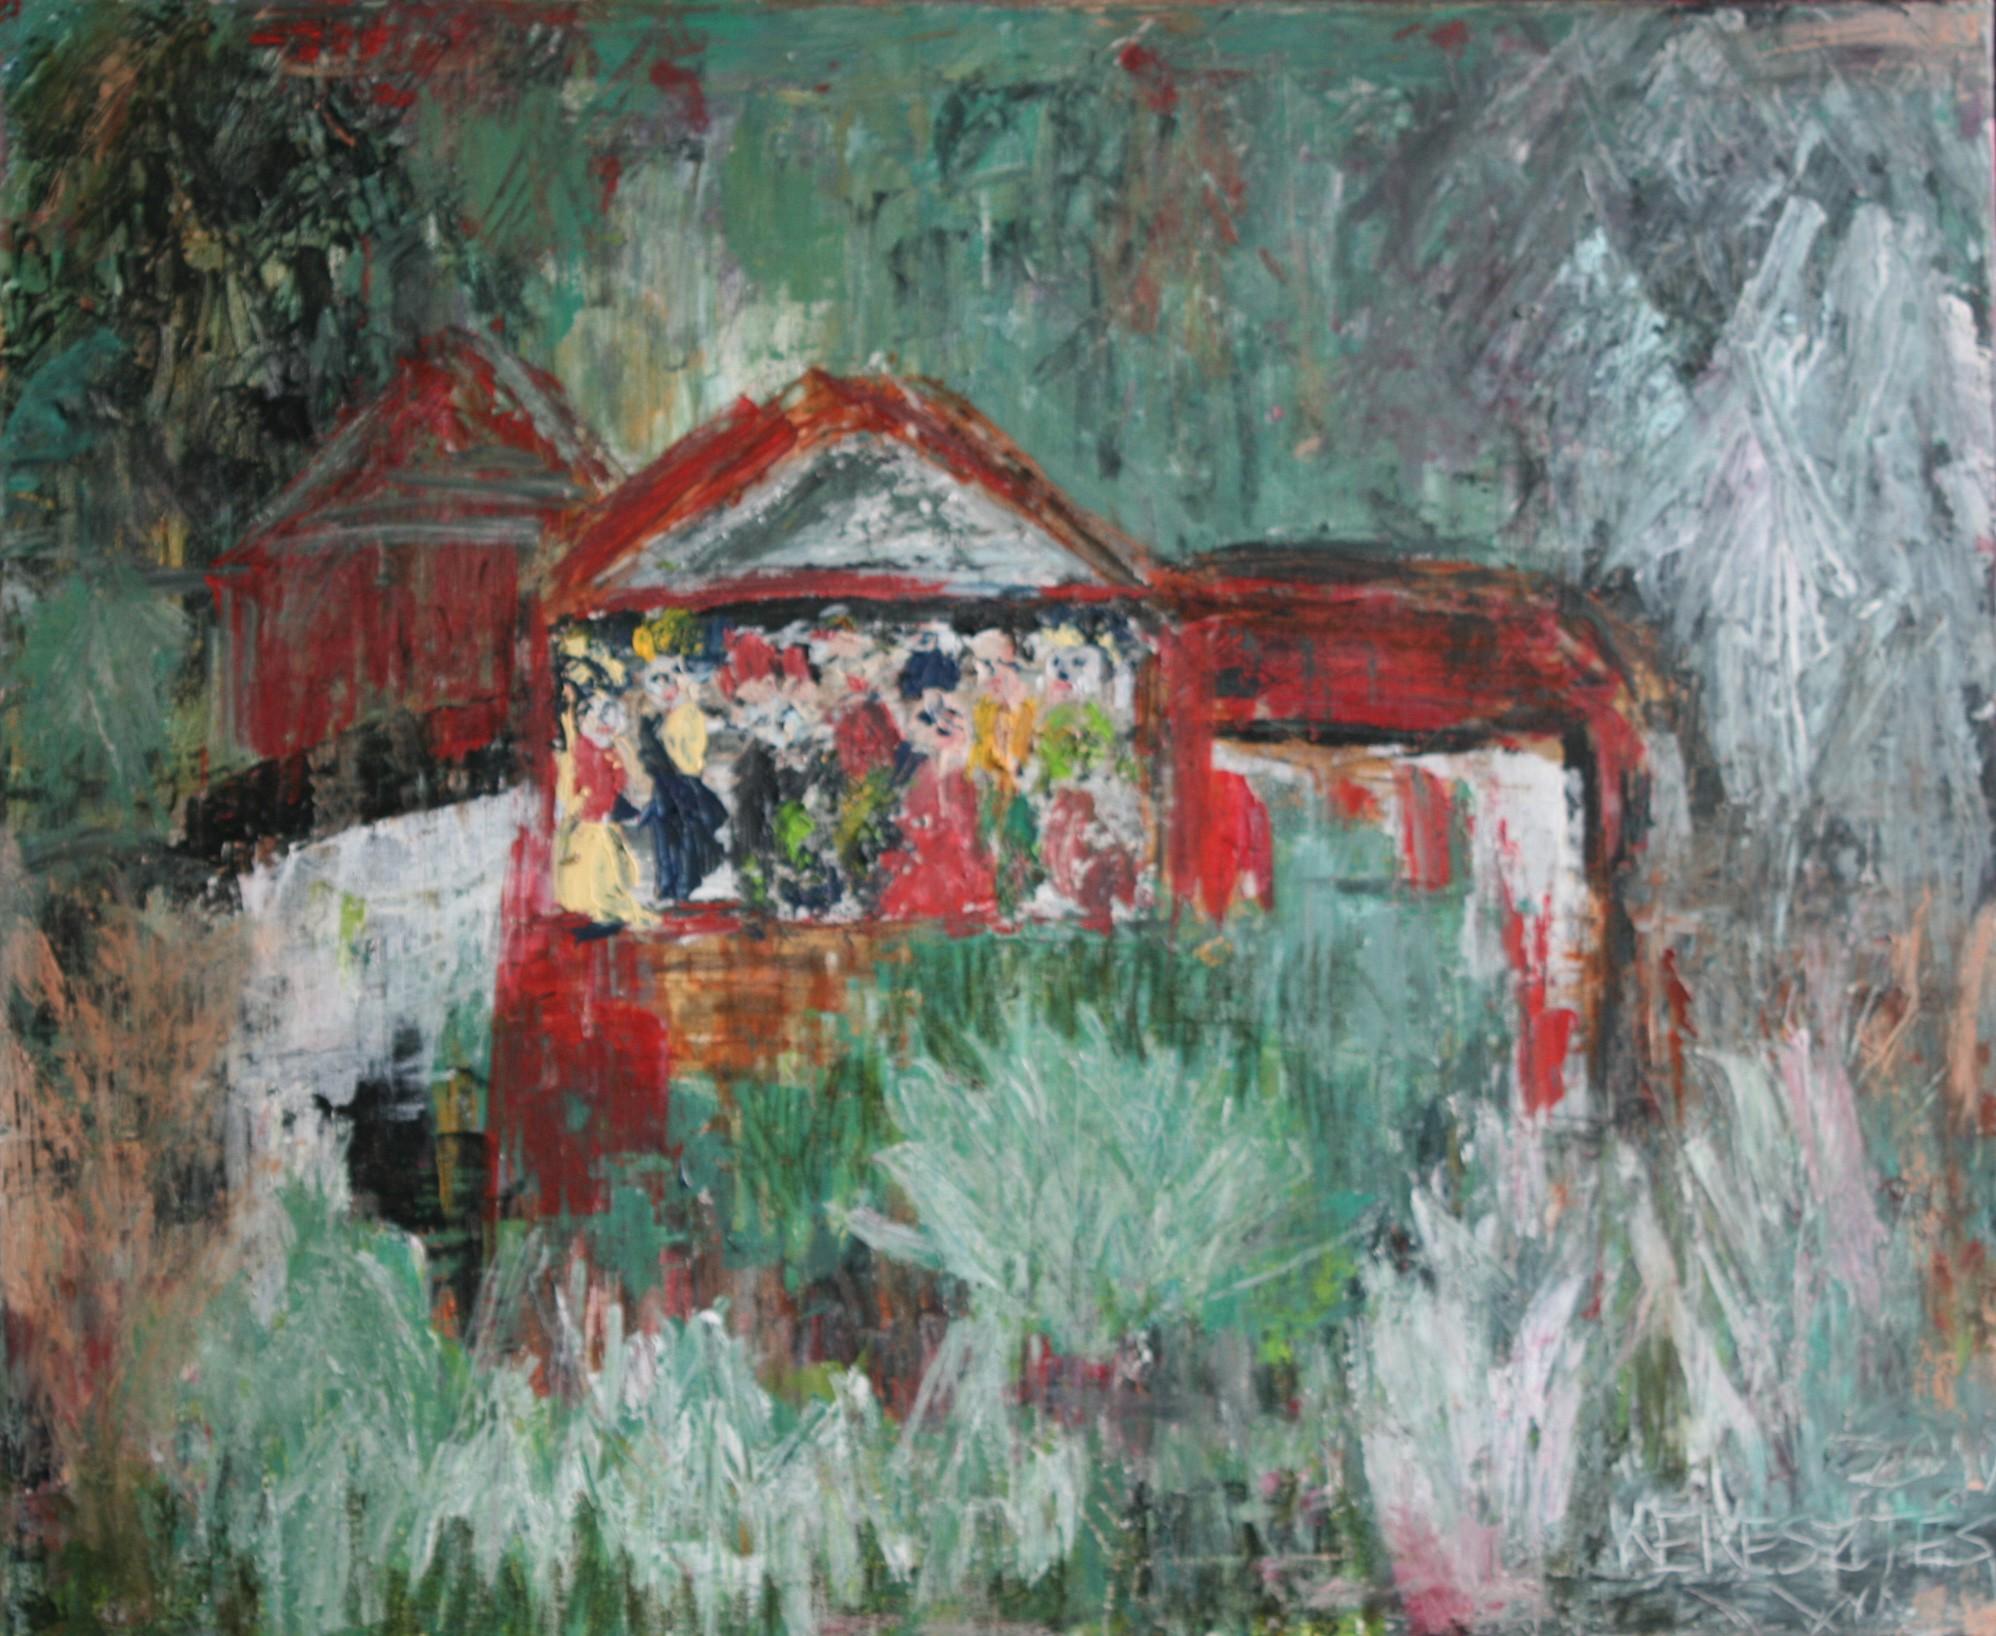 toile 74 - magdalena keresztes, artiste peintre à amiens